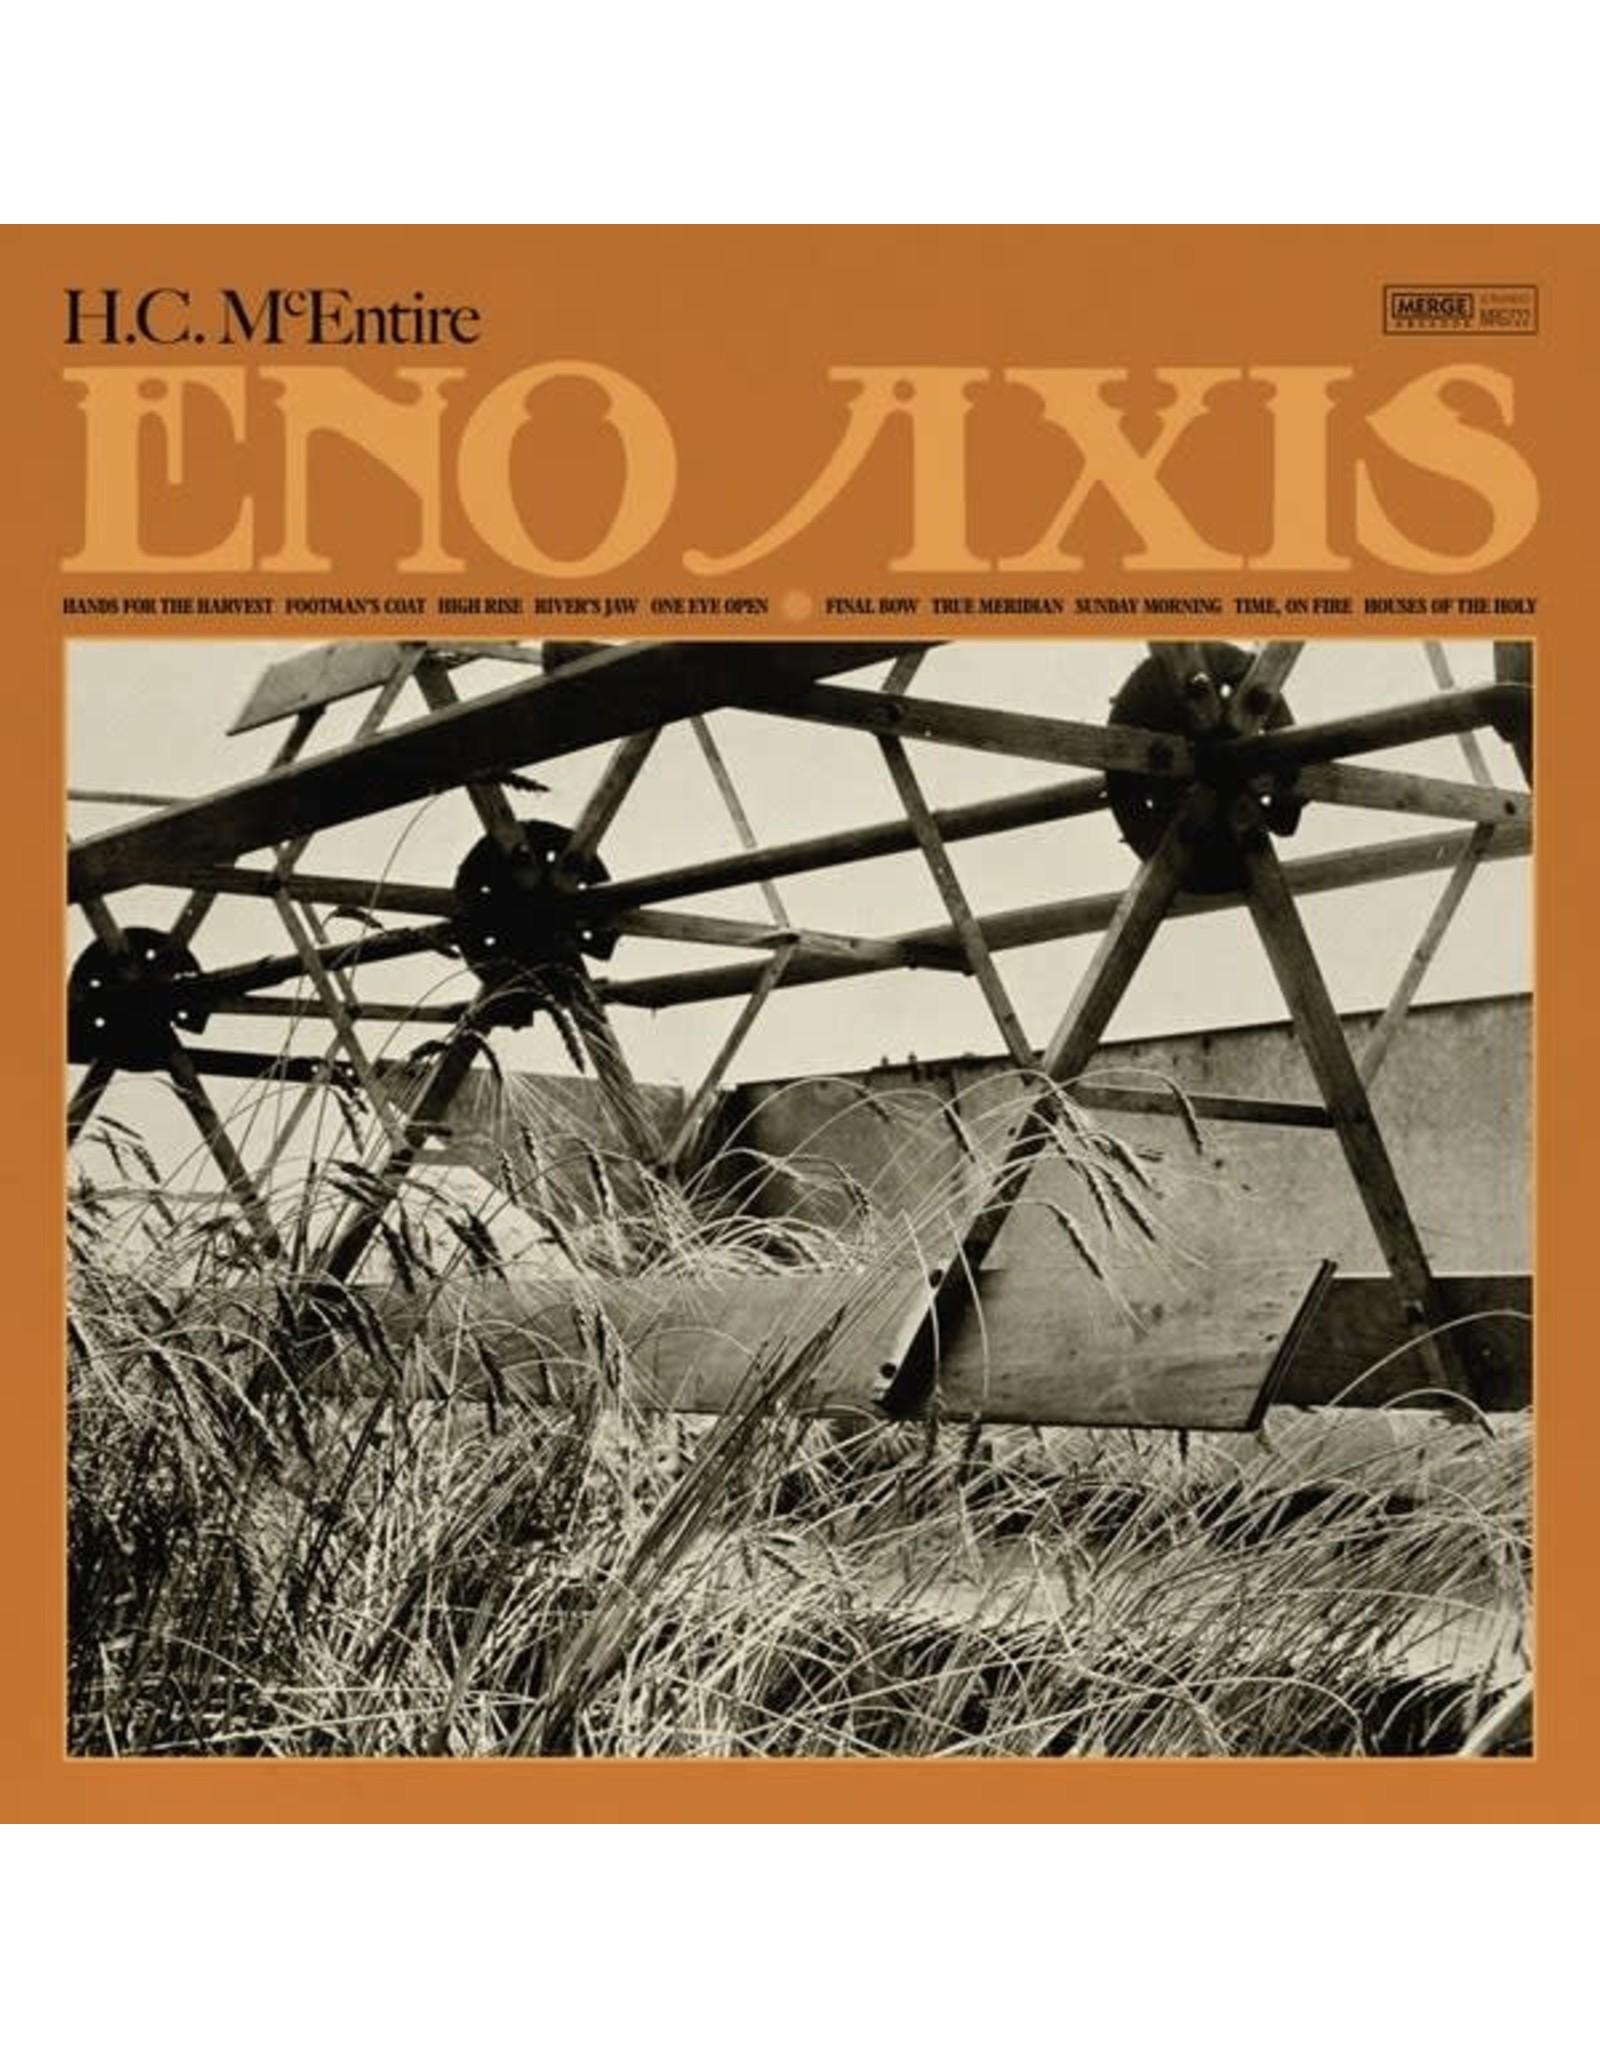 McEntire, H.C. - Eno Axis LP (marble)